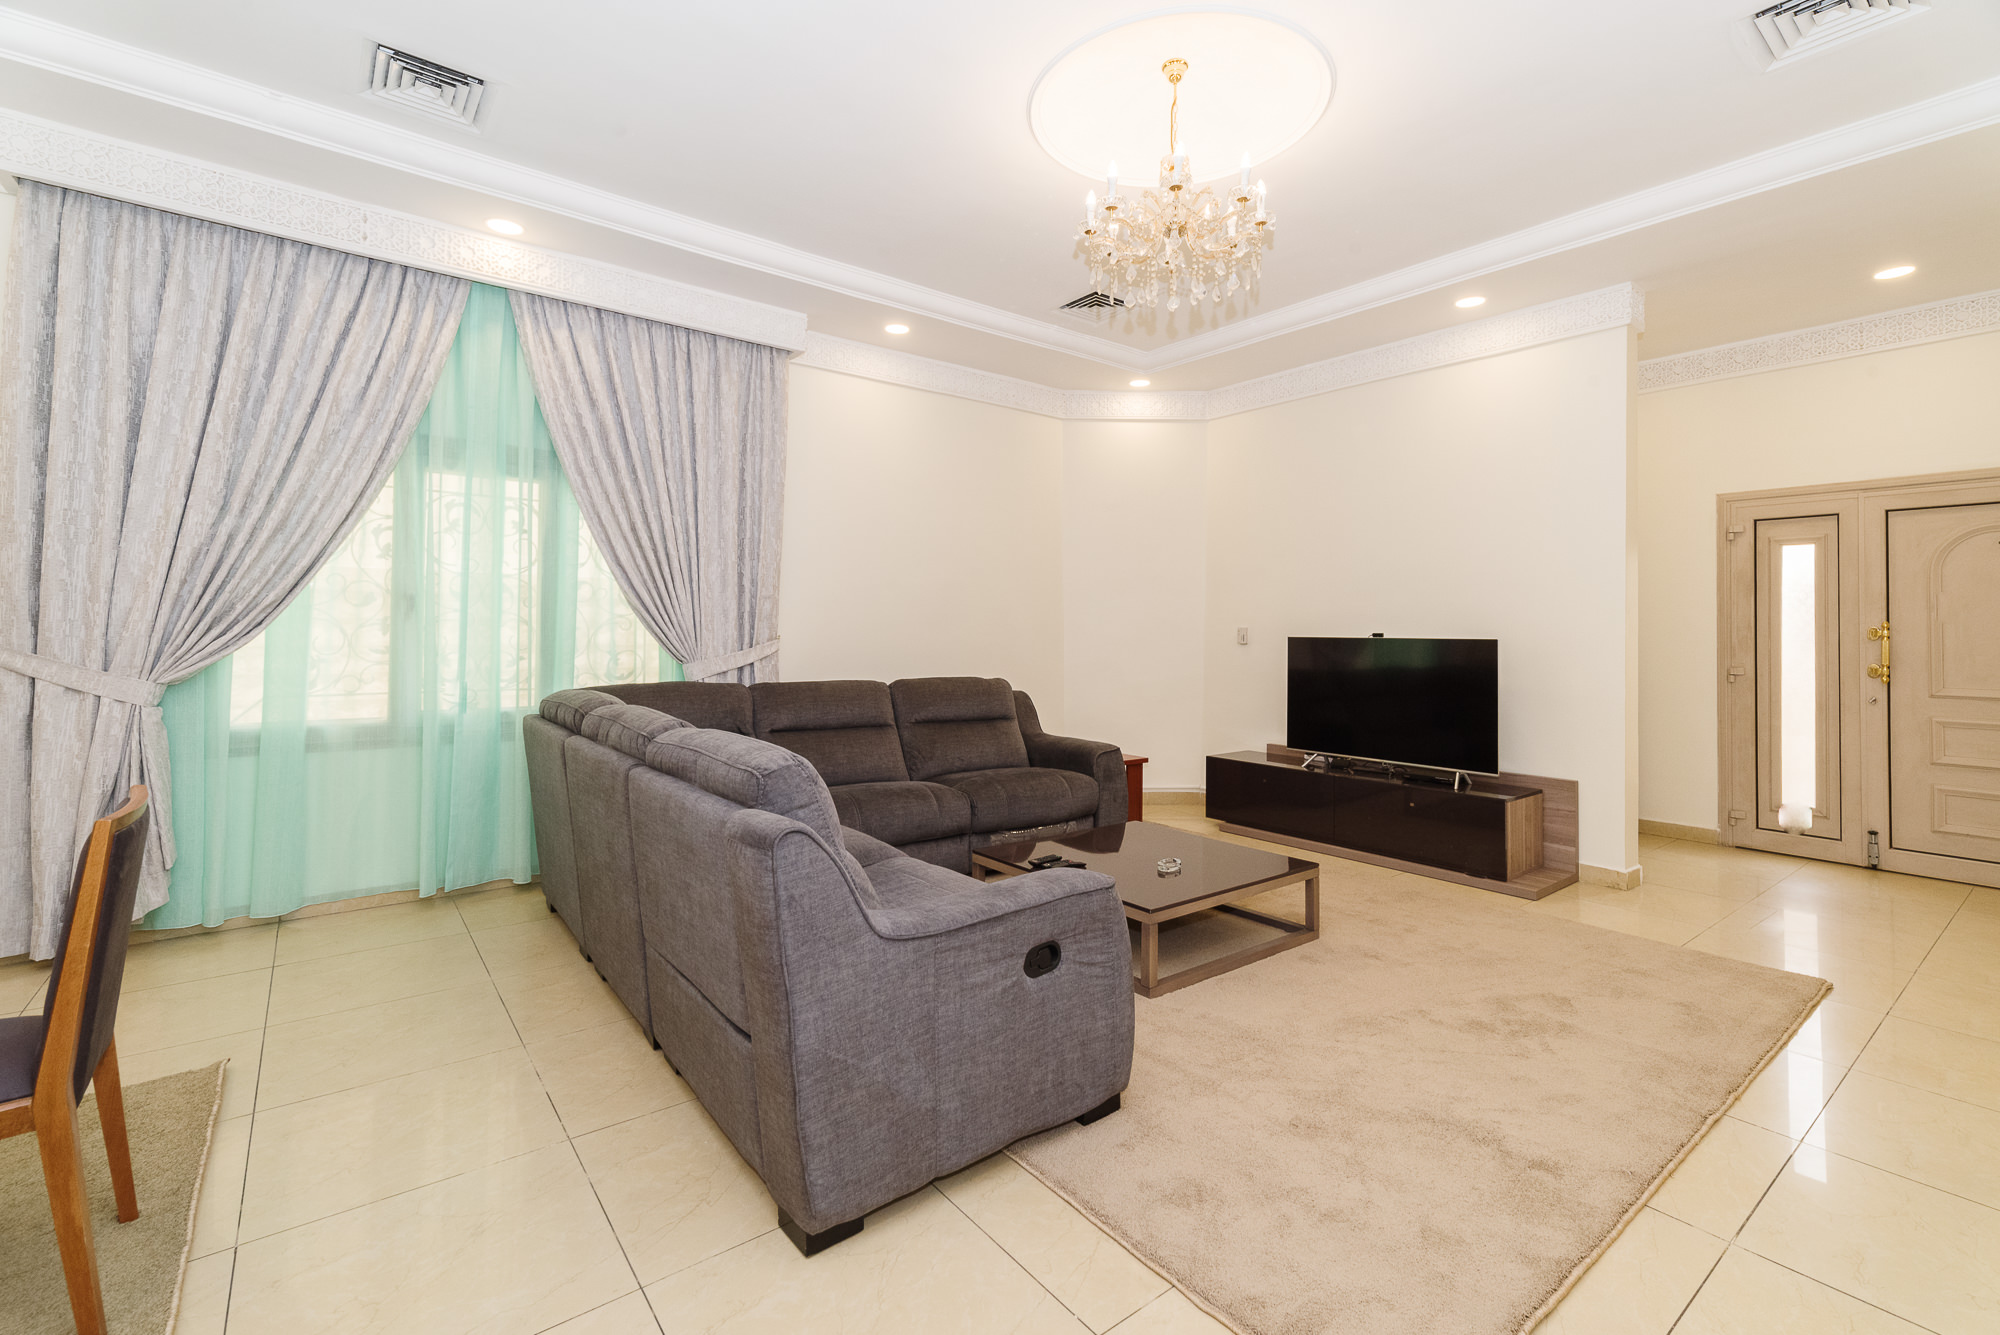 Salwa – spacious, furnished three bedroom ground floor apartment